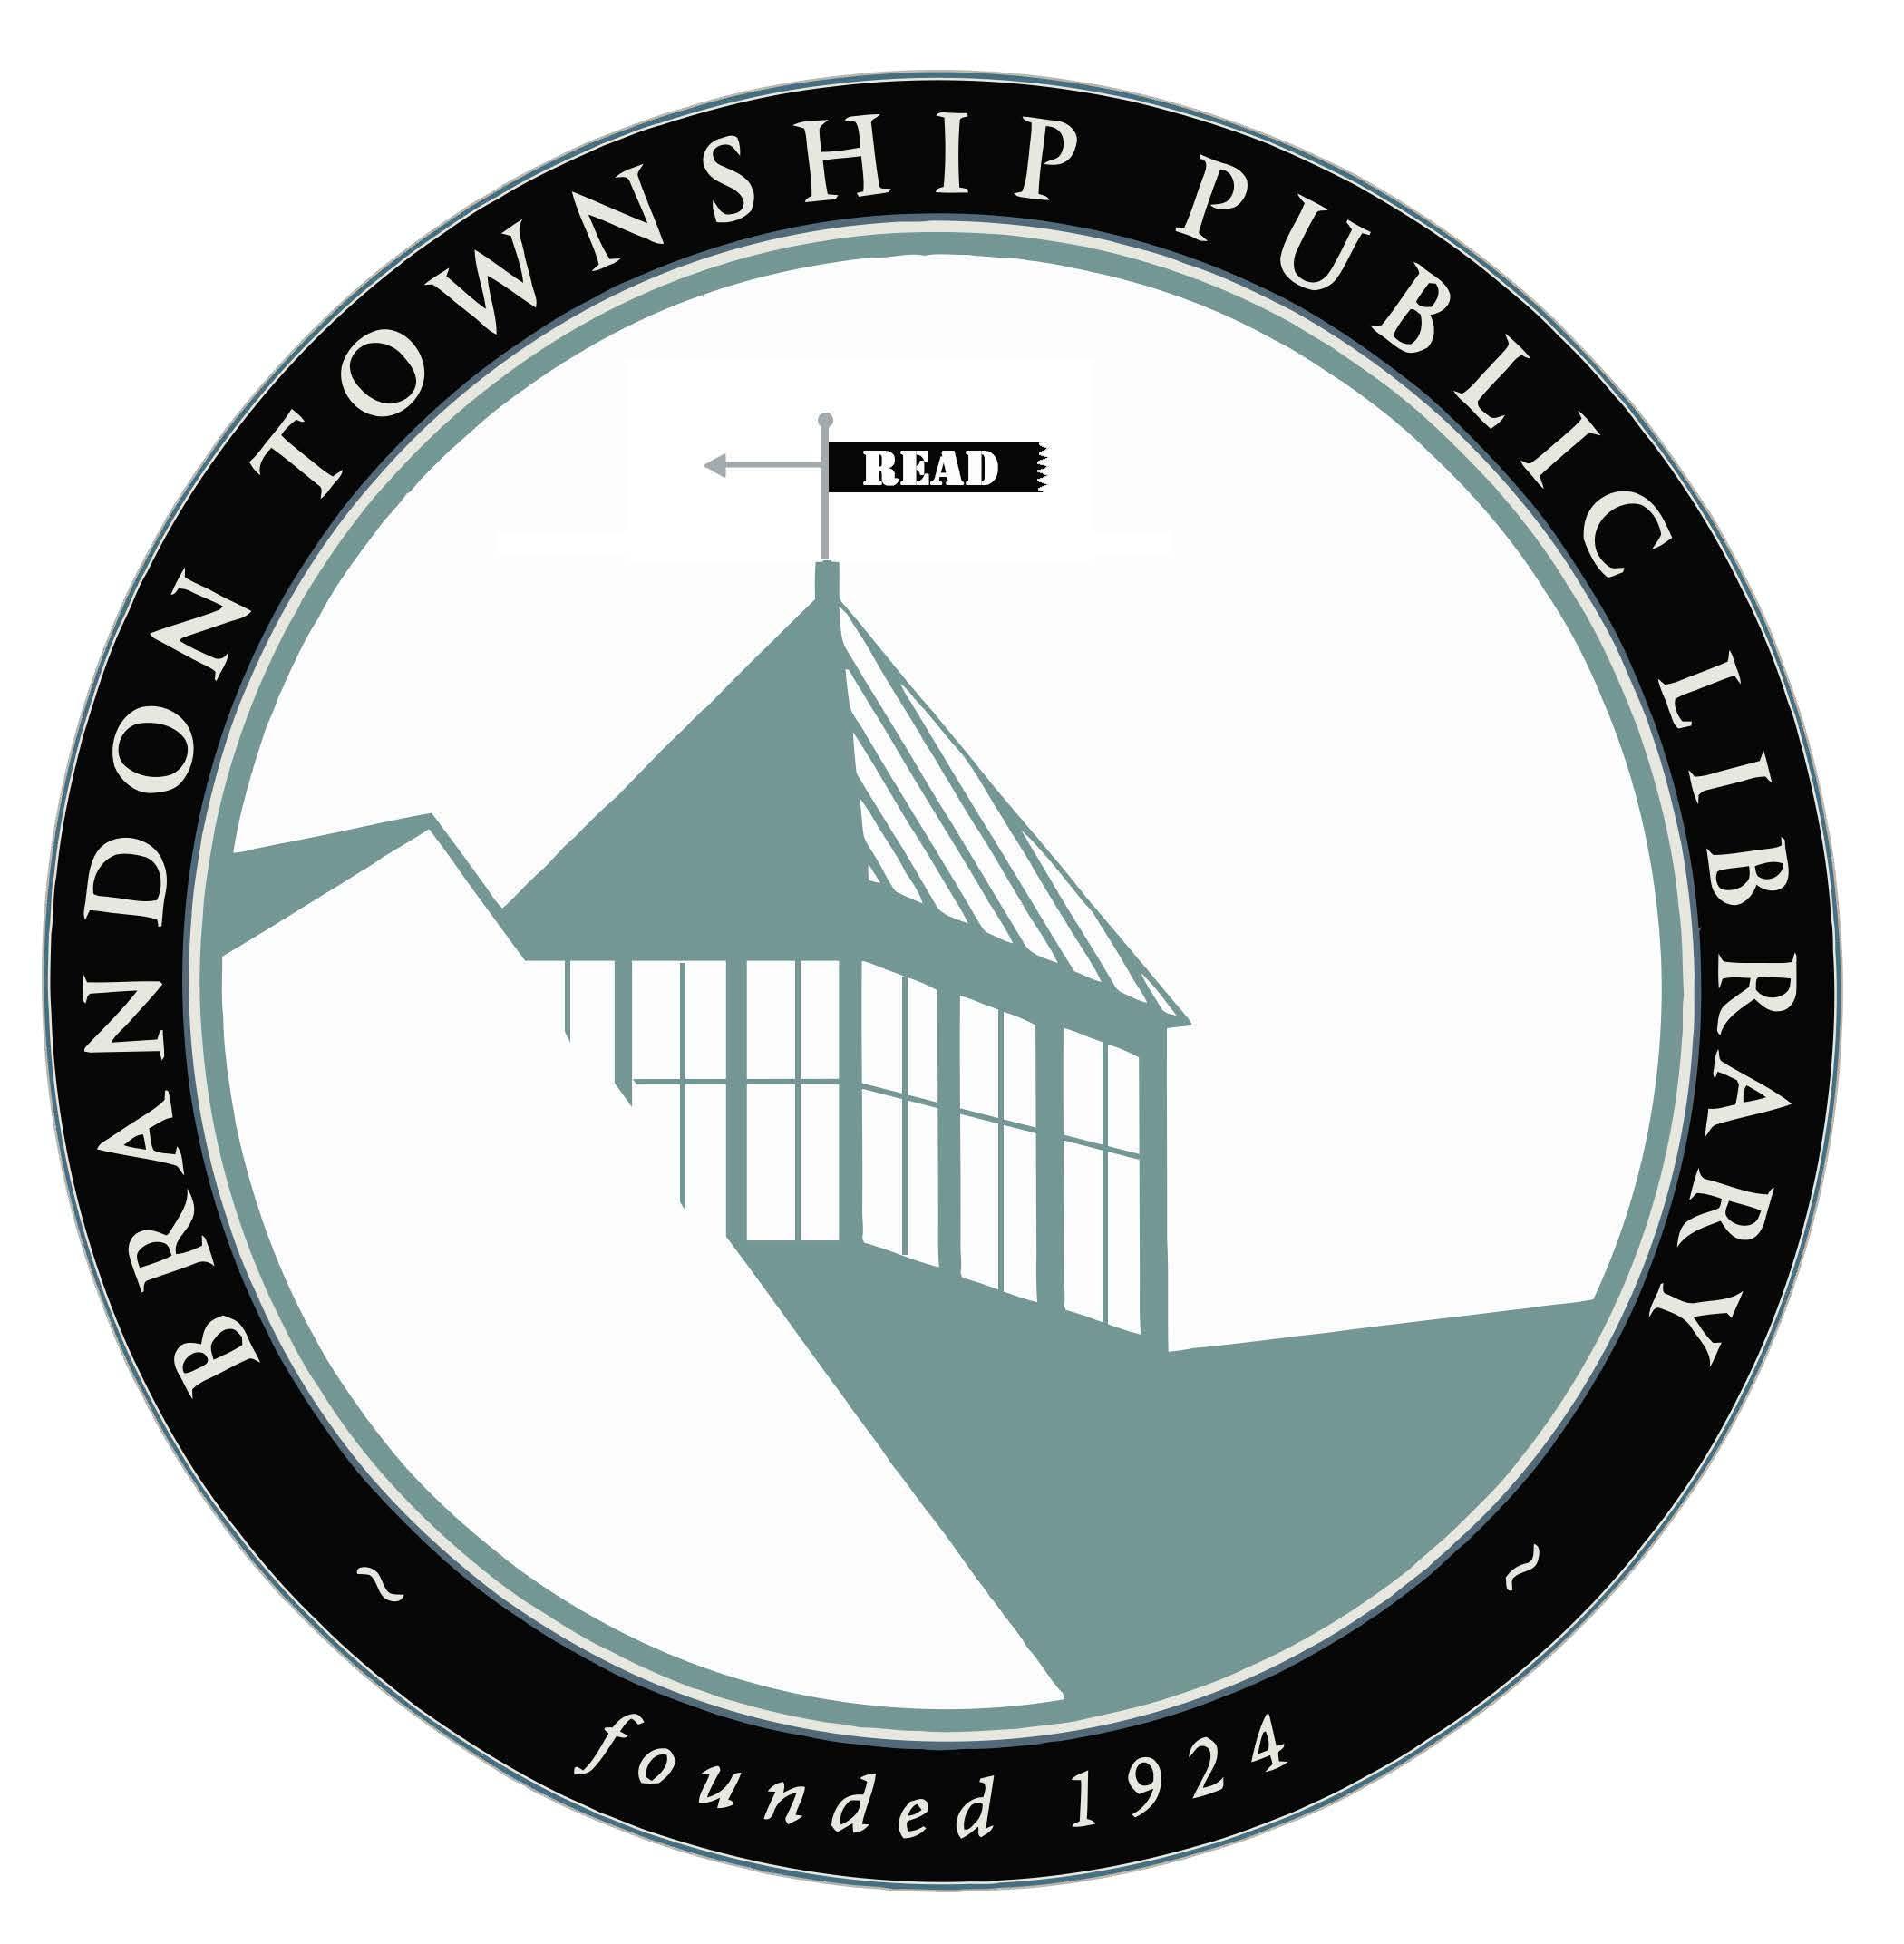 Brandon Township Public Library